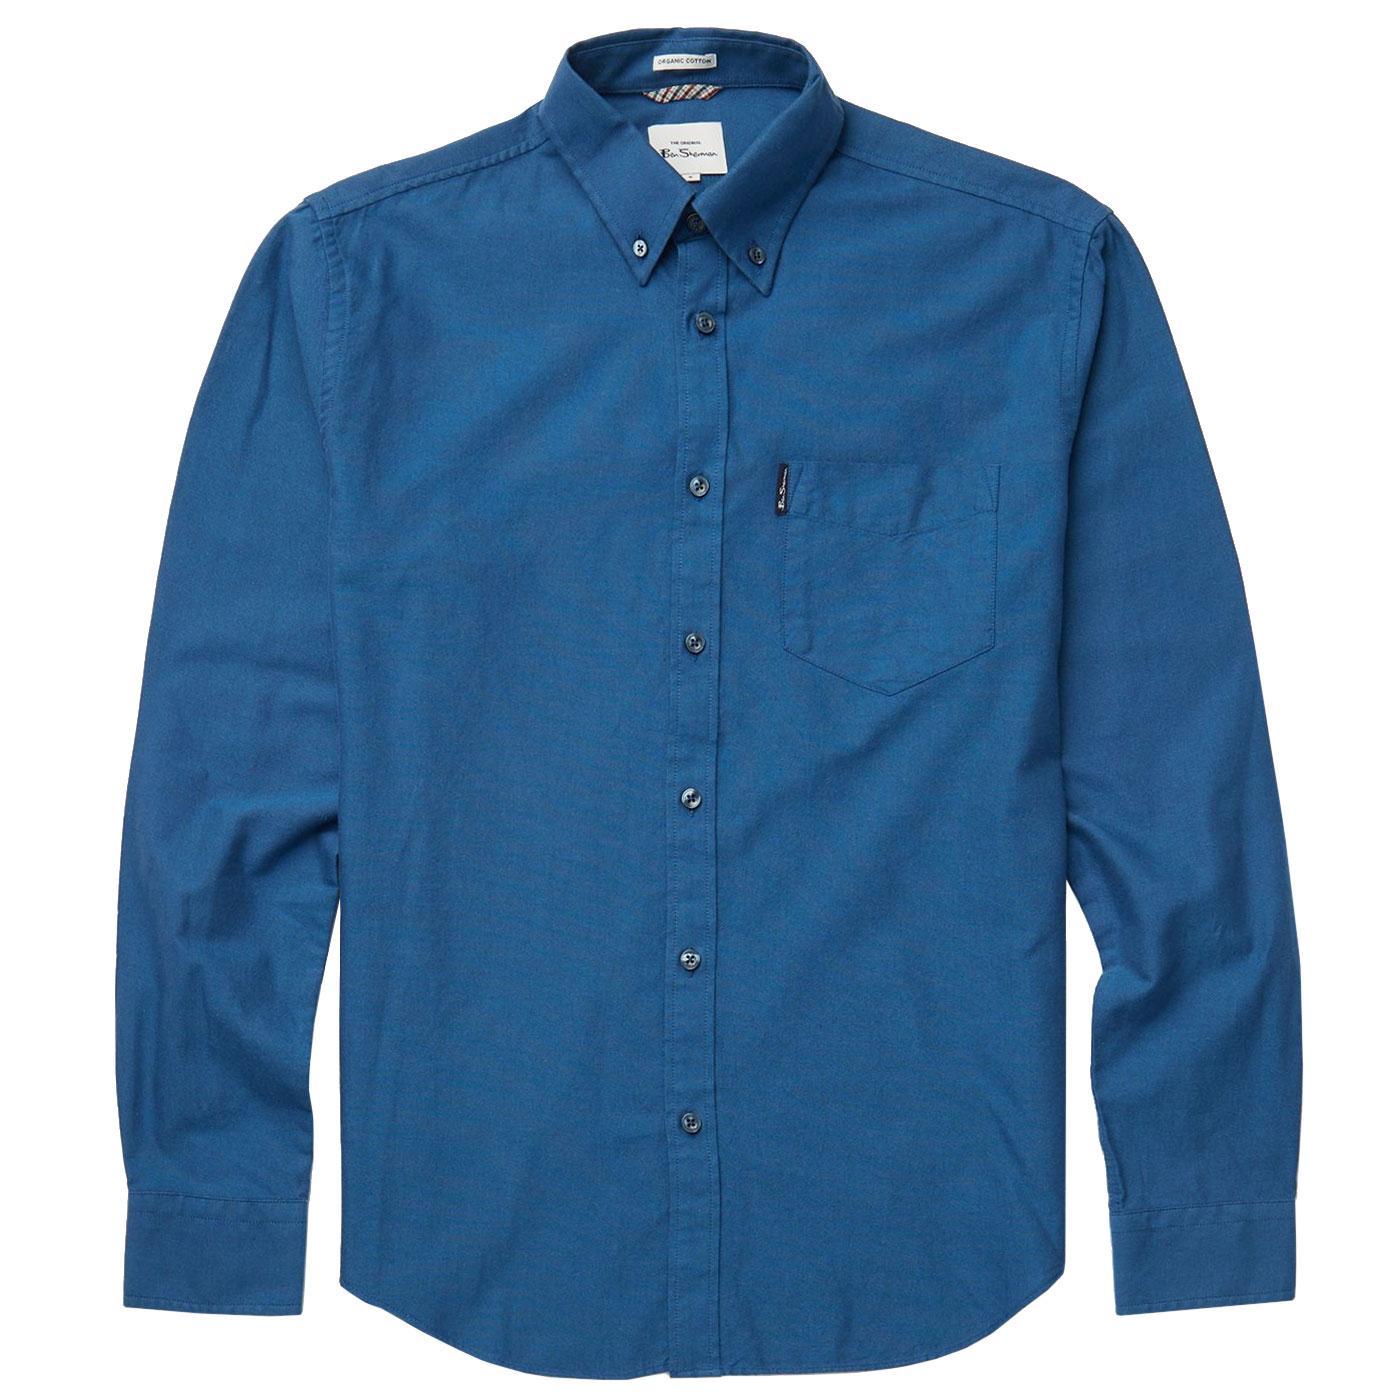 BEN SHERMAN Signature Button Down Oxford Shirt PB